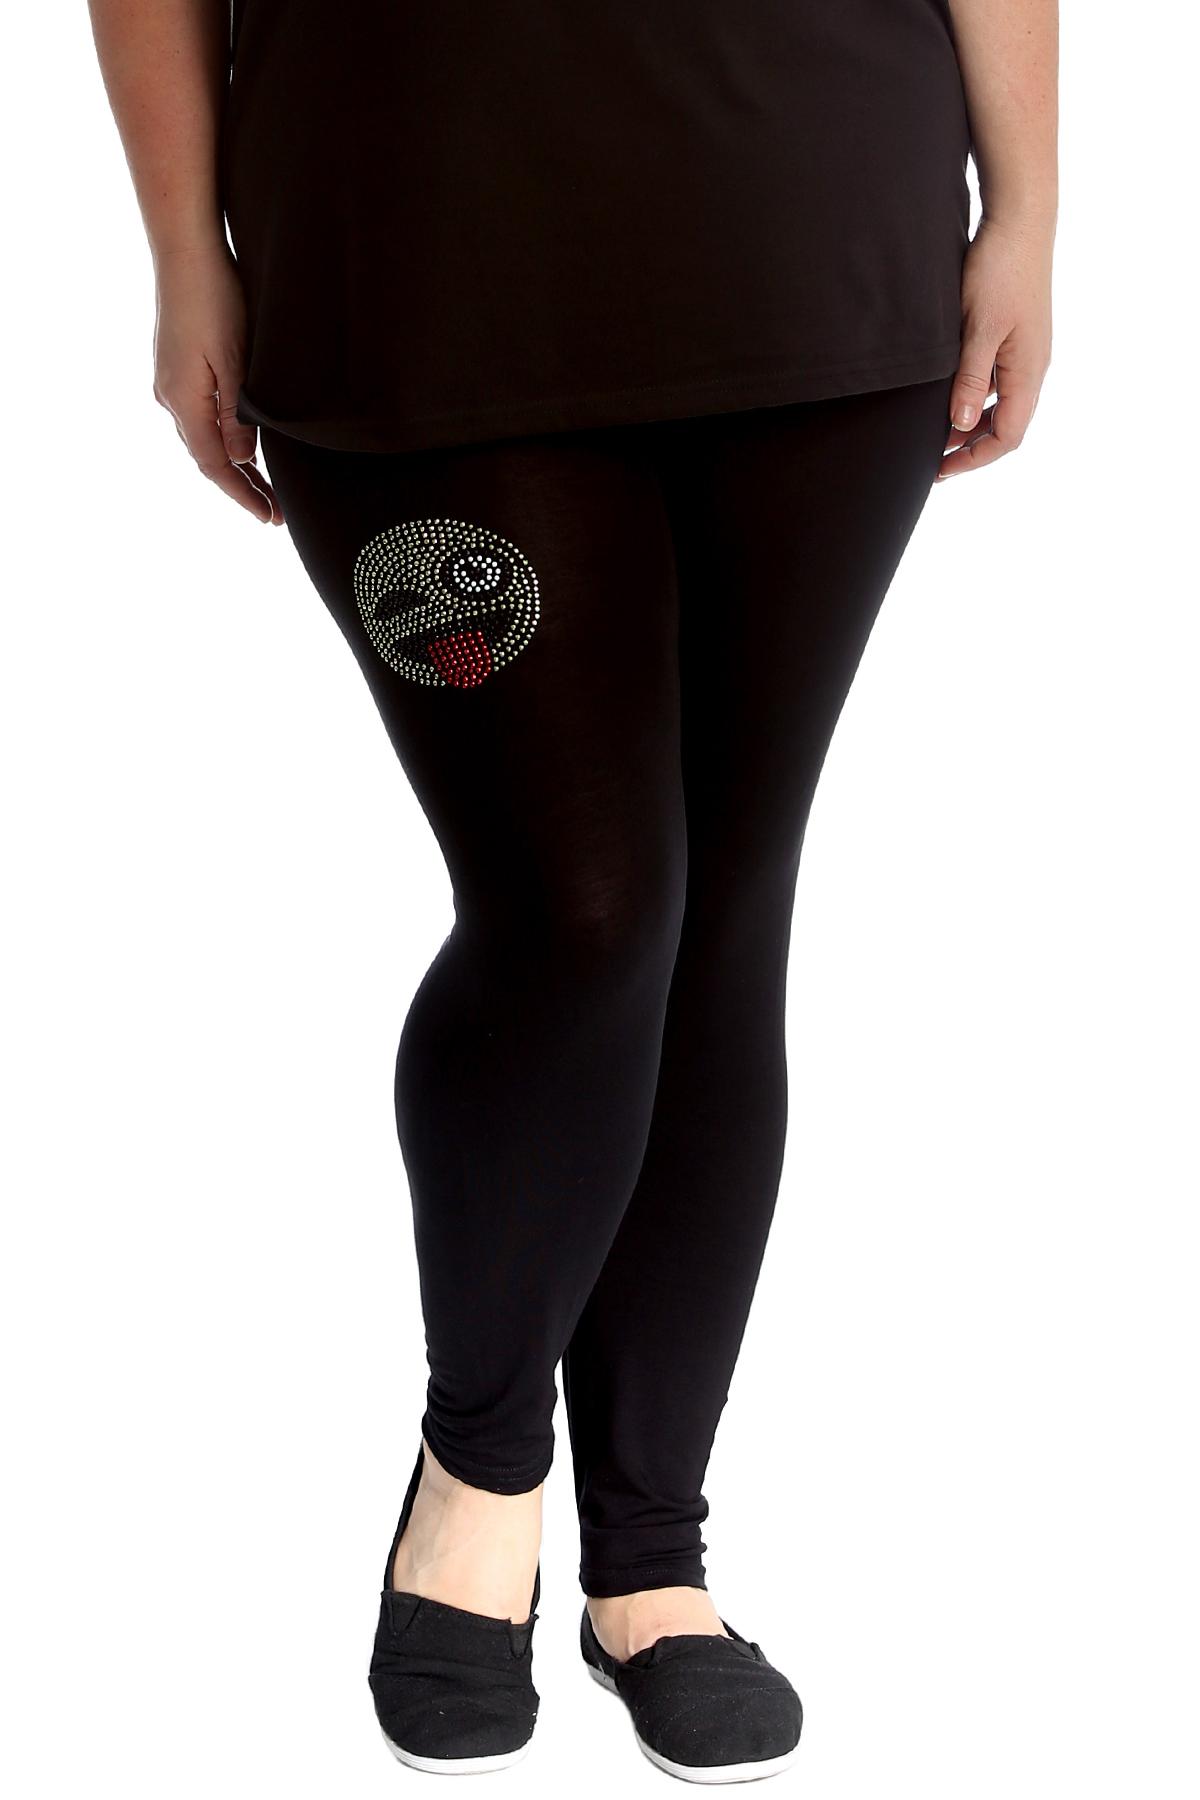 1bdc1d801e4a3a Details about New Womens Plus Size Leggings Ladies Emoji Stud Bottoms  Rhinestone Pants Elastic